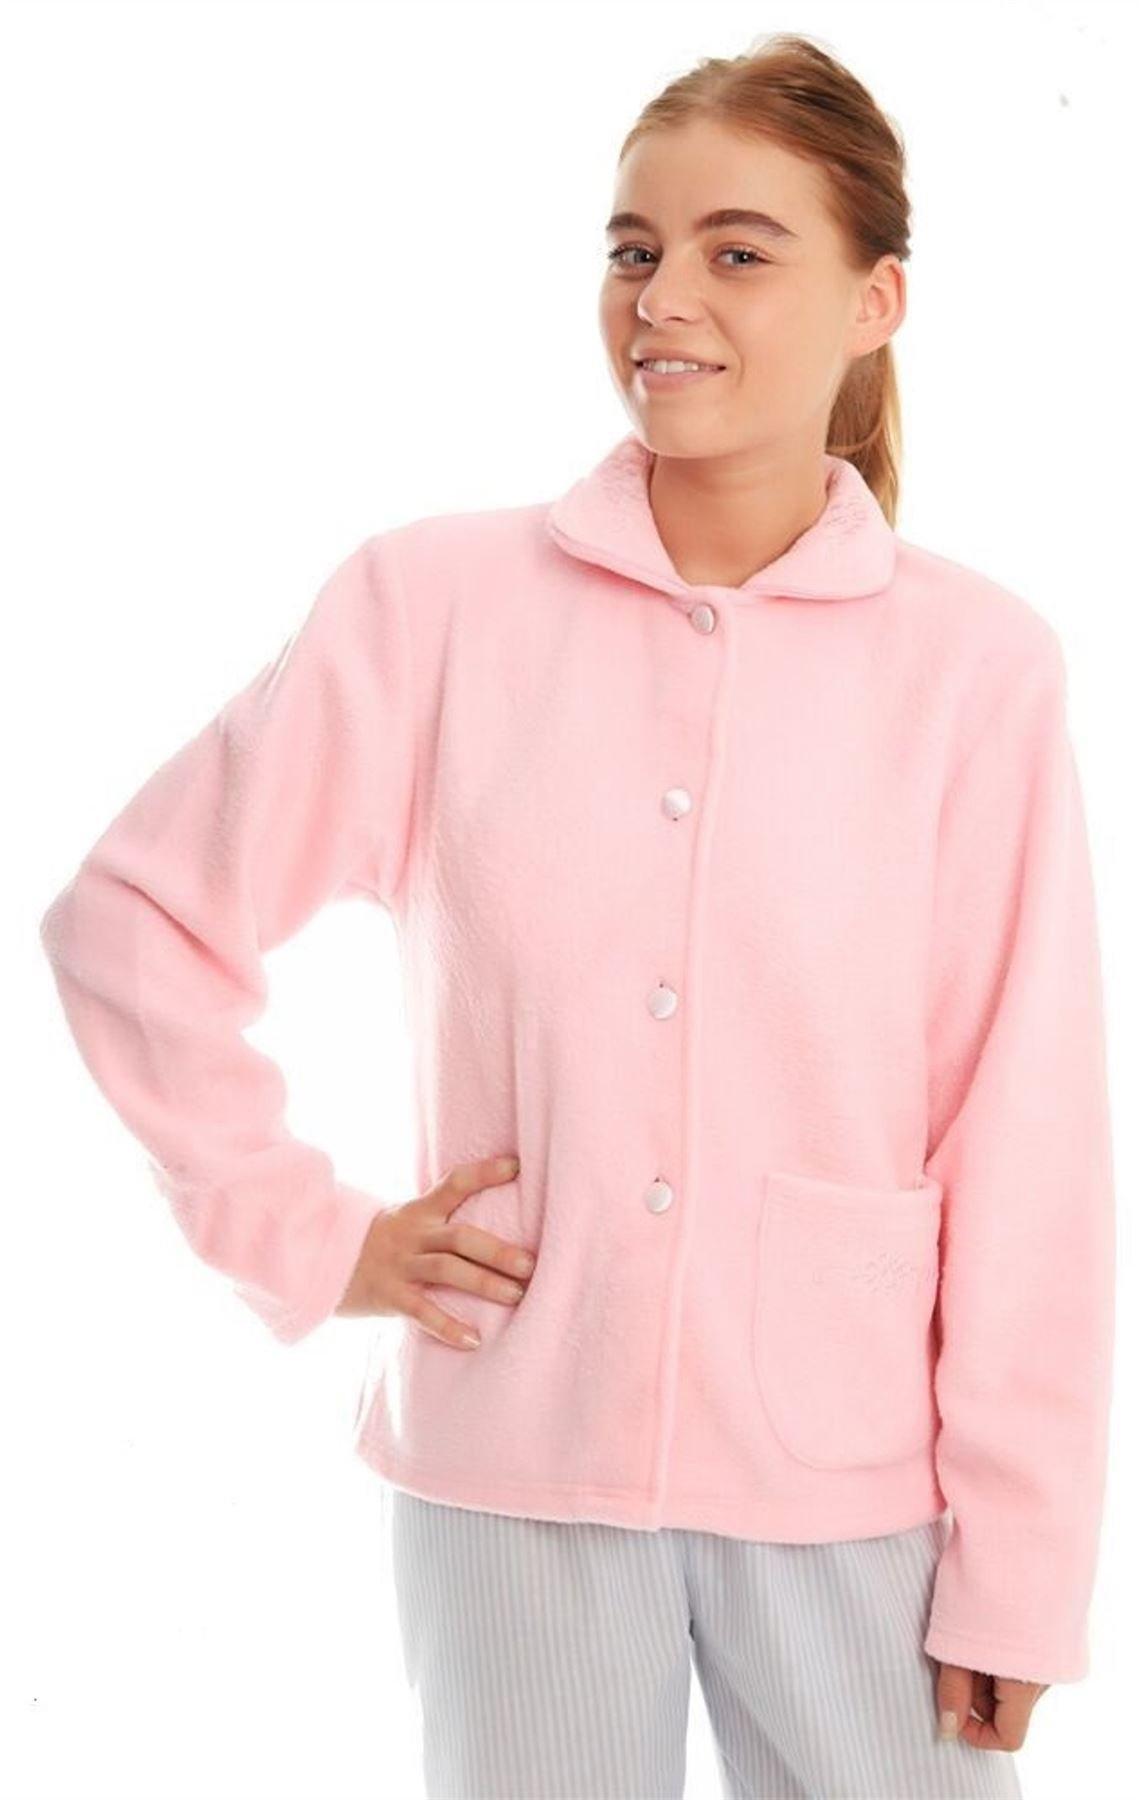 Undercover Women's Ladyolga Fleece Bed Jackets 18-20 Pink